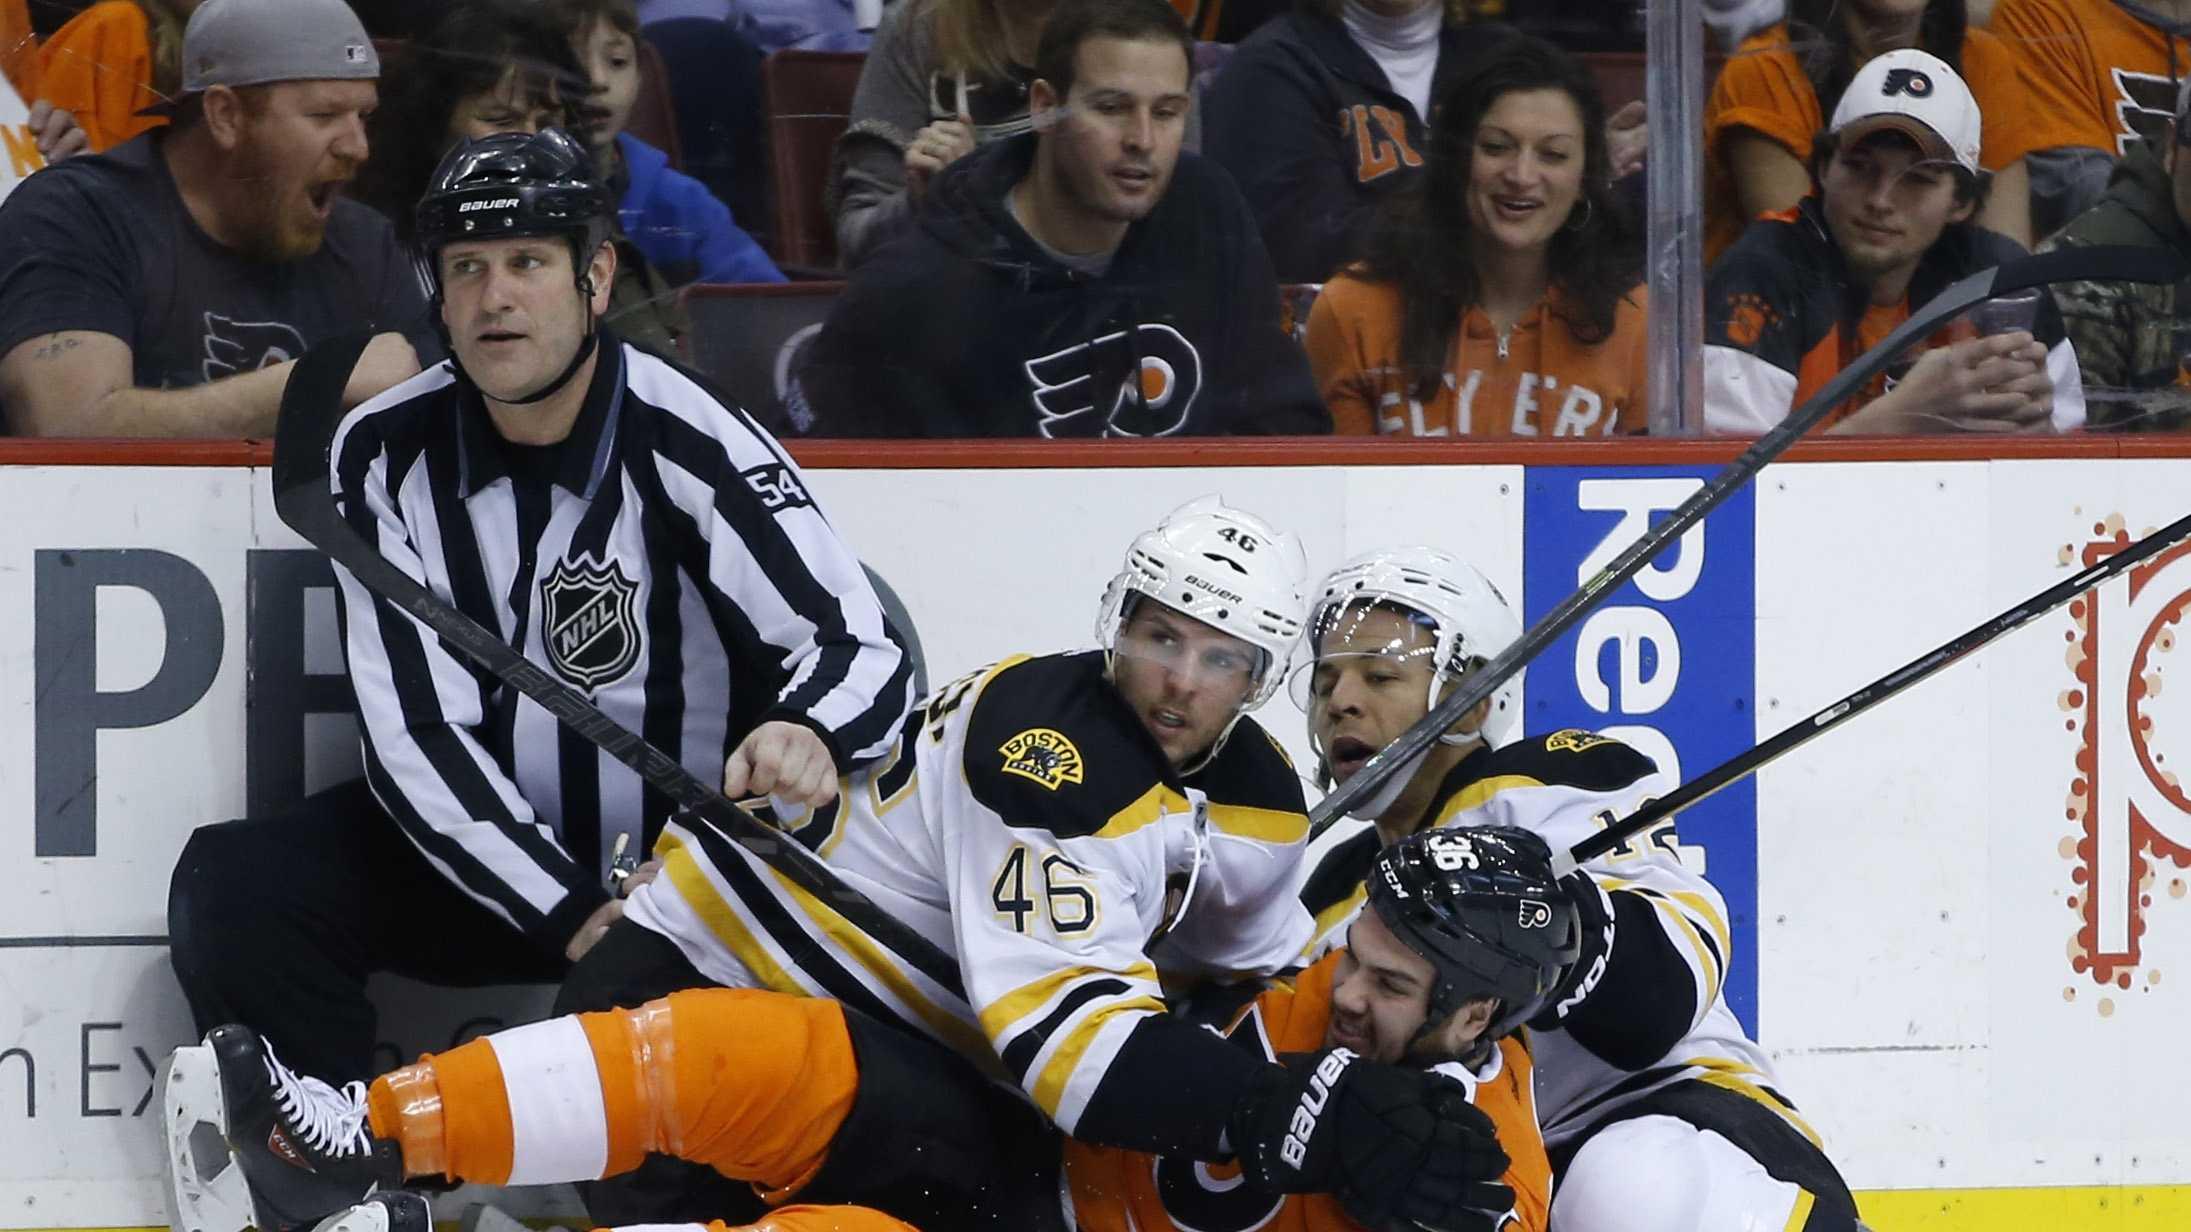 Bruins Flyers 033014.jpg